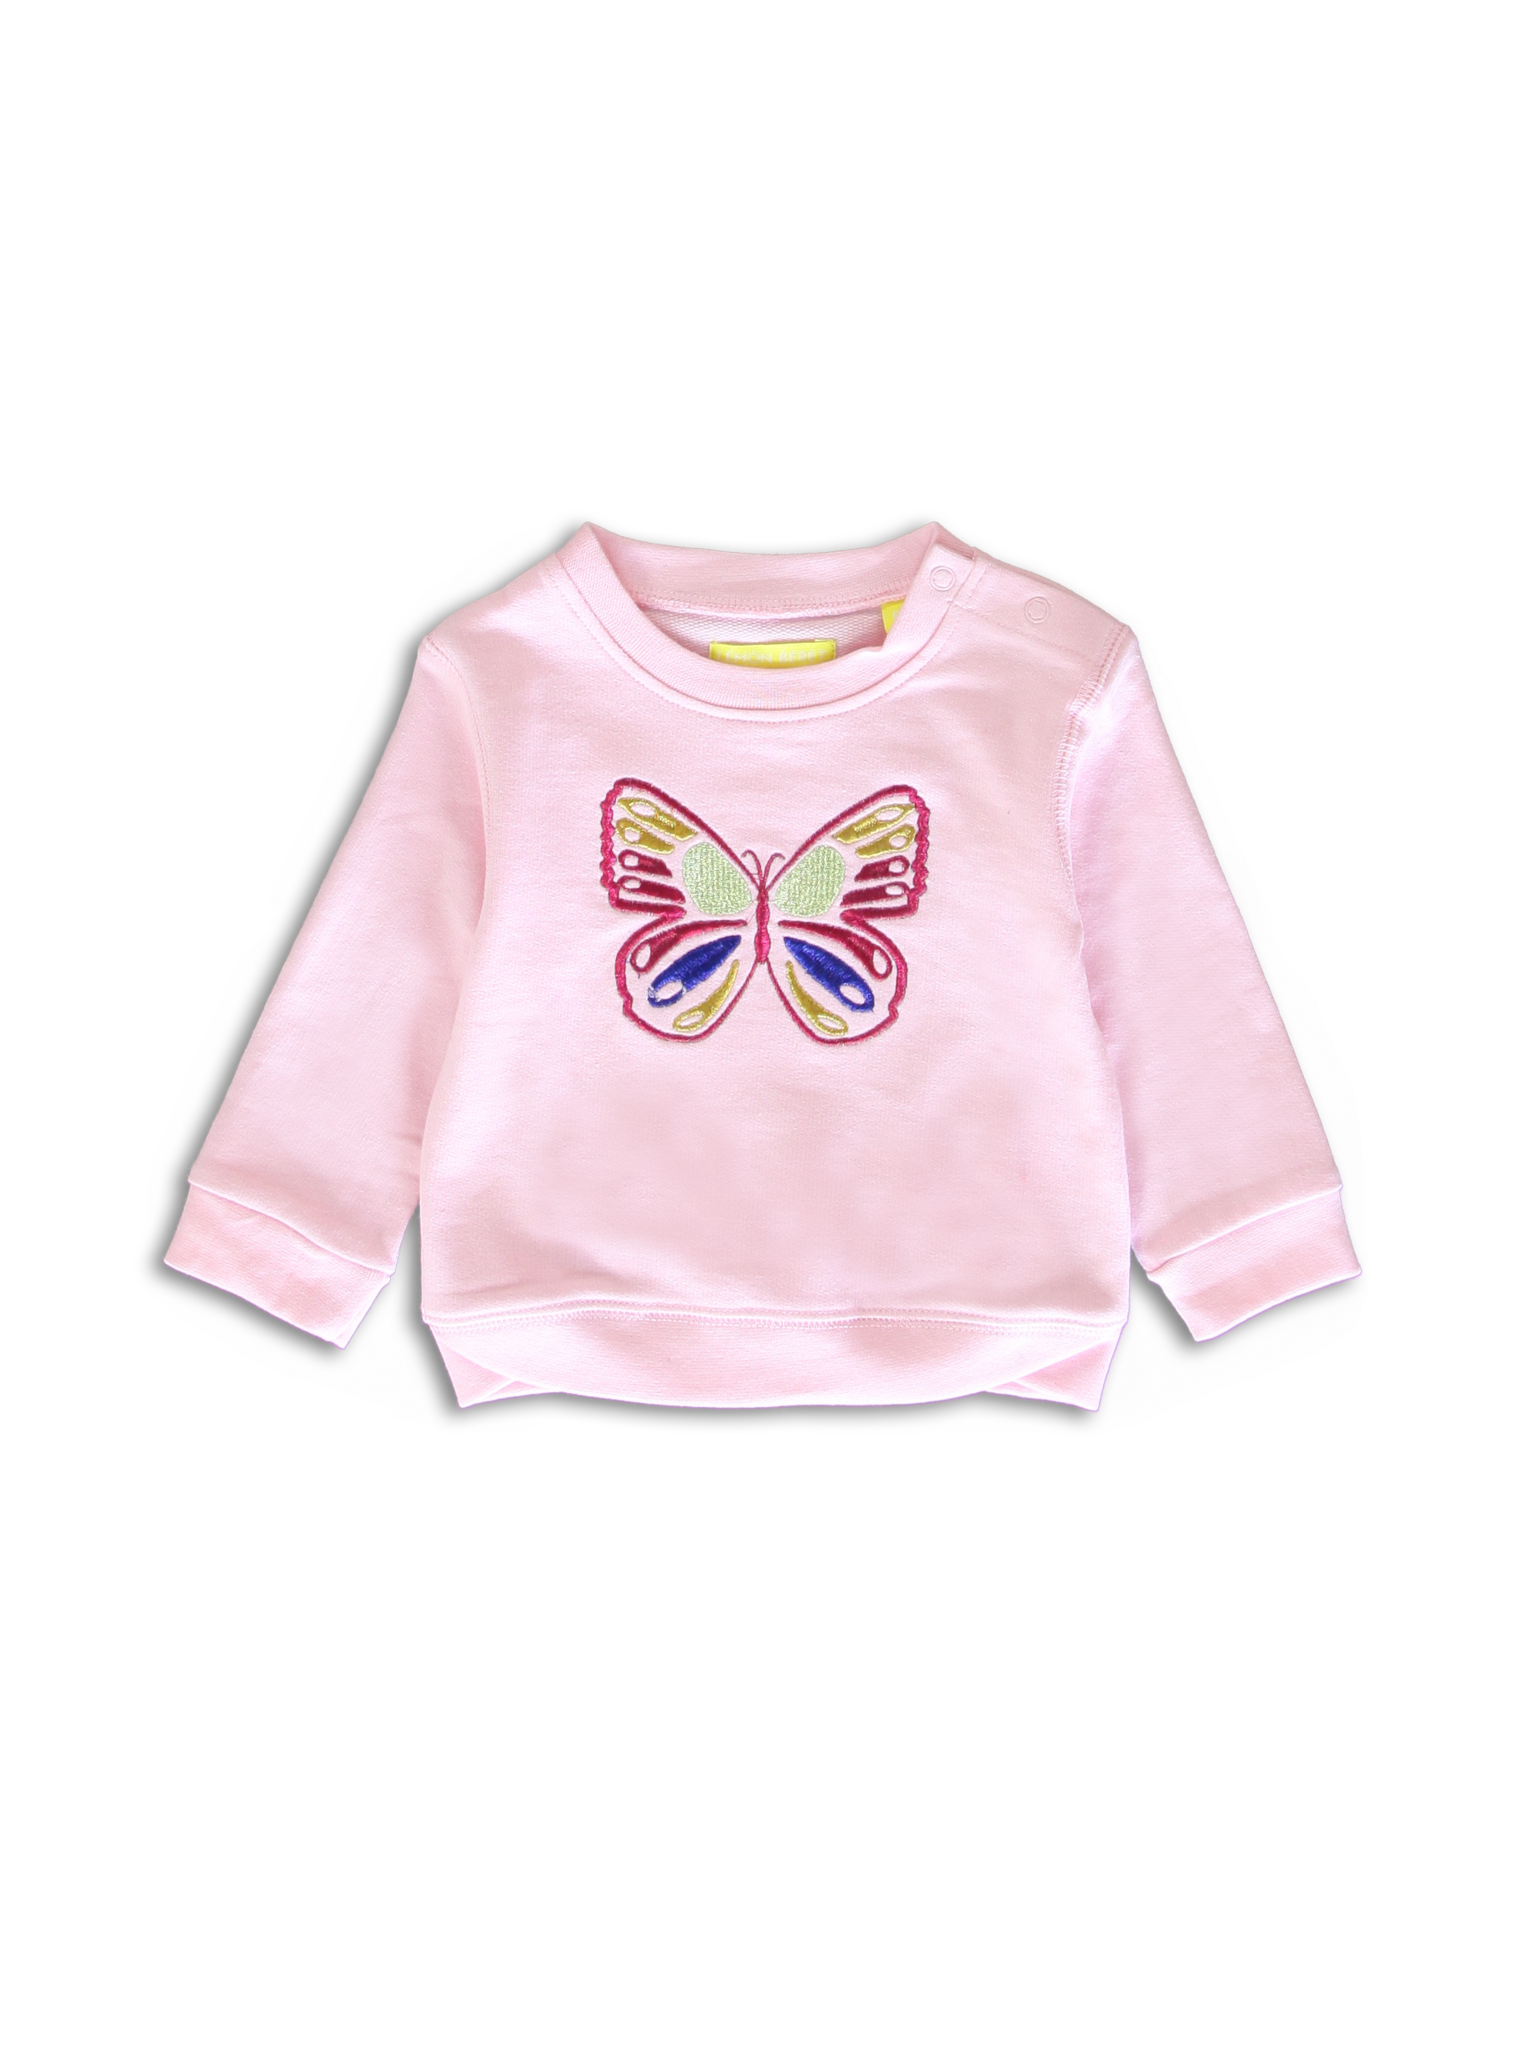 All Brands   Summerproducts Baby   Sweatshirt   8 pcs/box